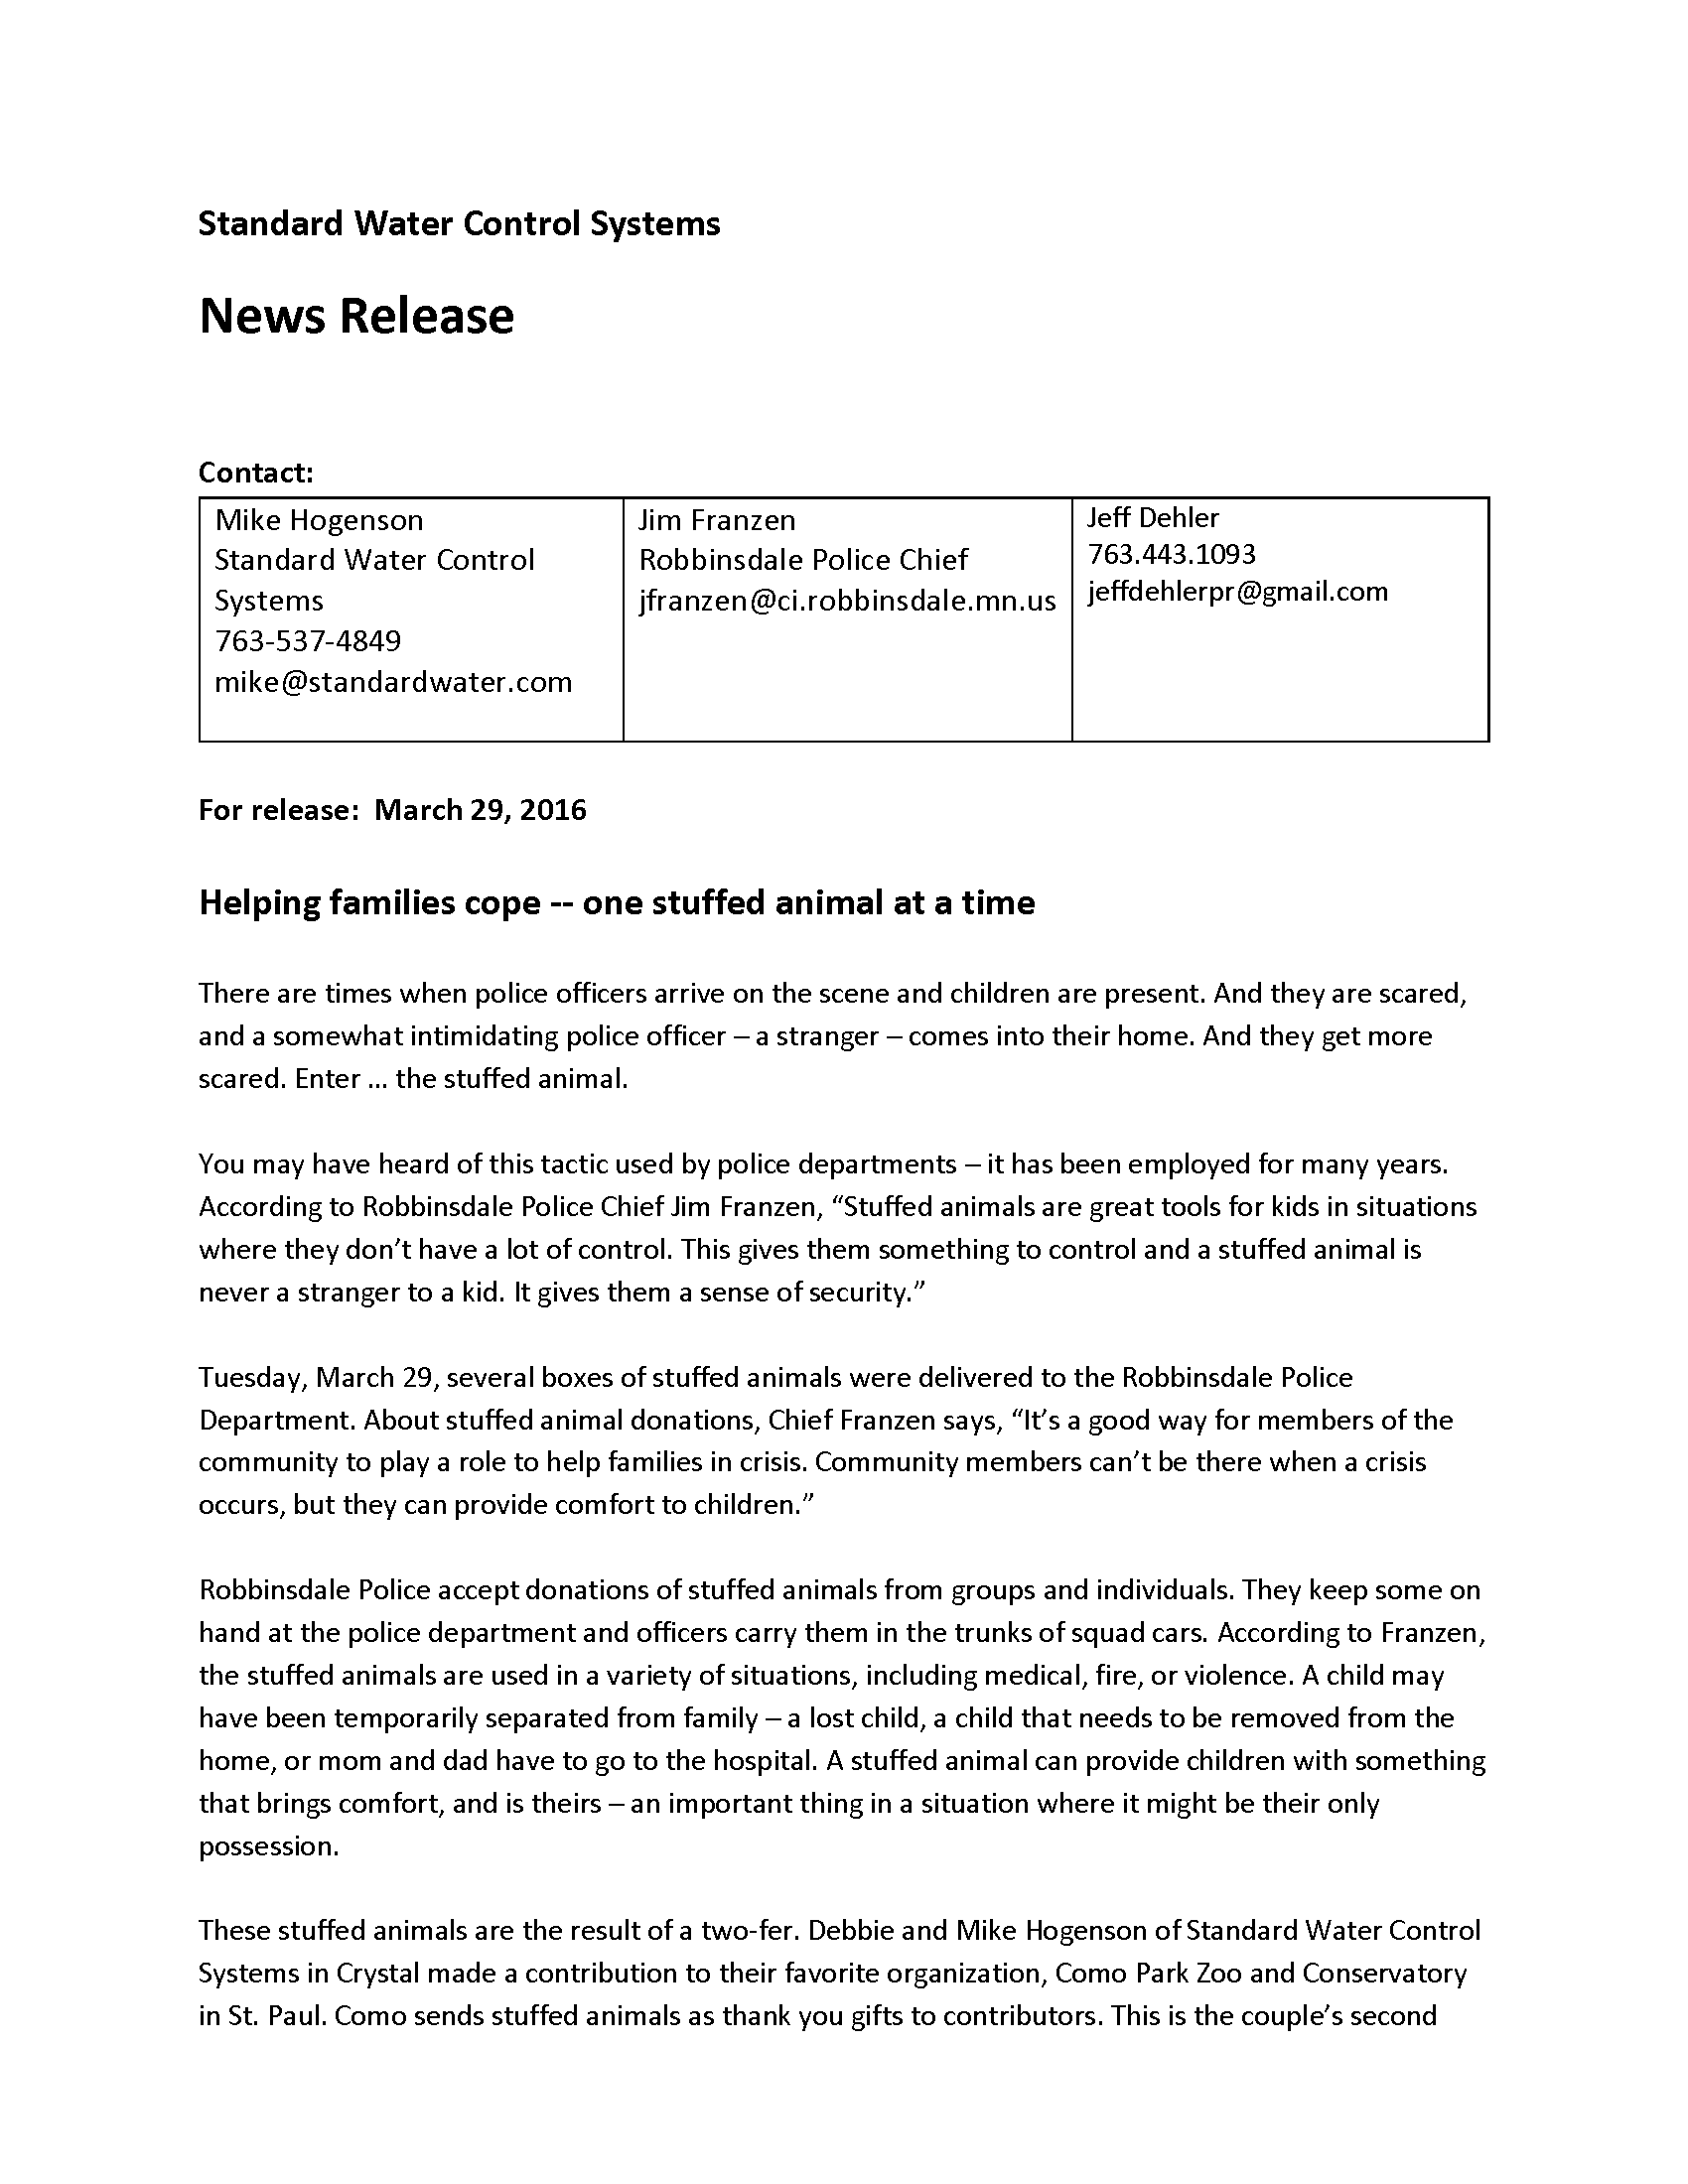 Stuffed animal donation press release_Page_1